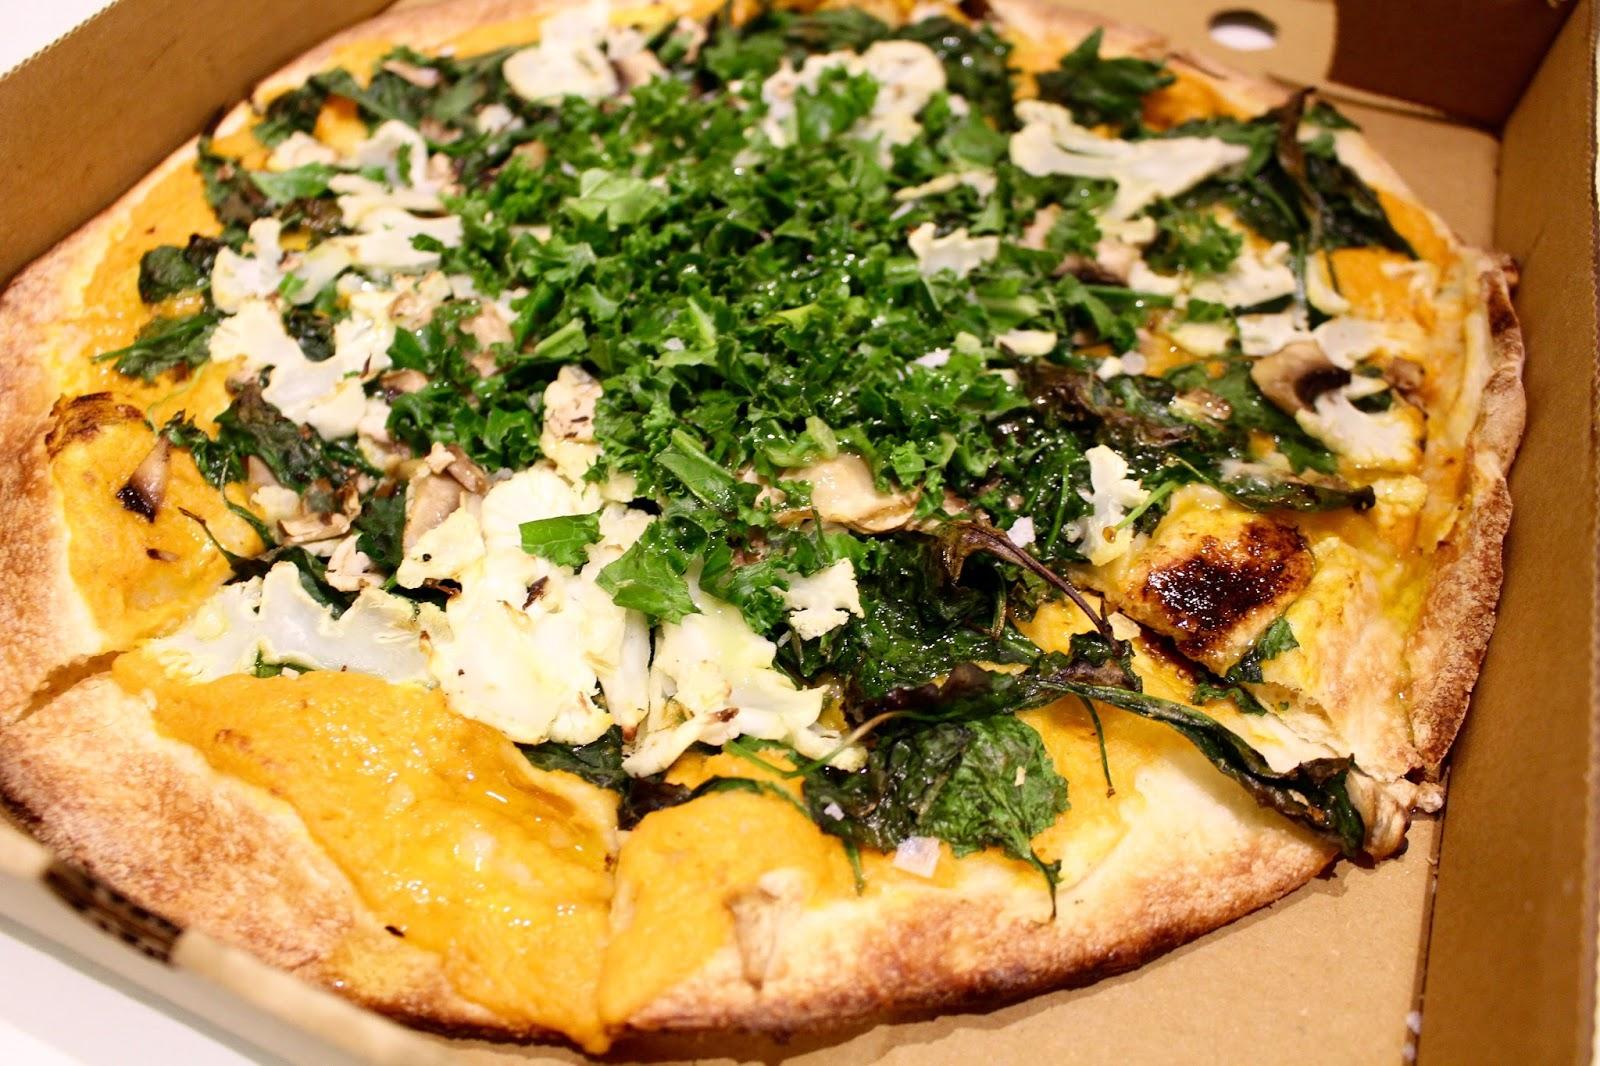 Otomat's Vegan Pizza | The Recipe